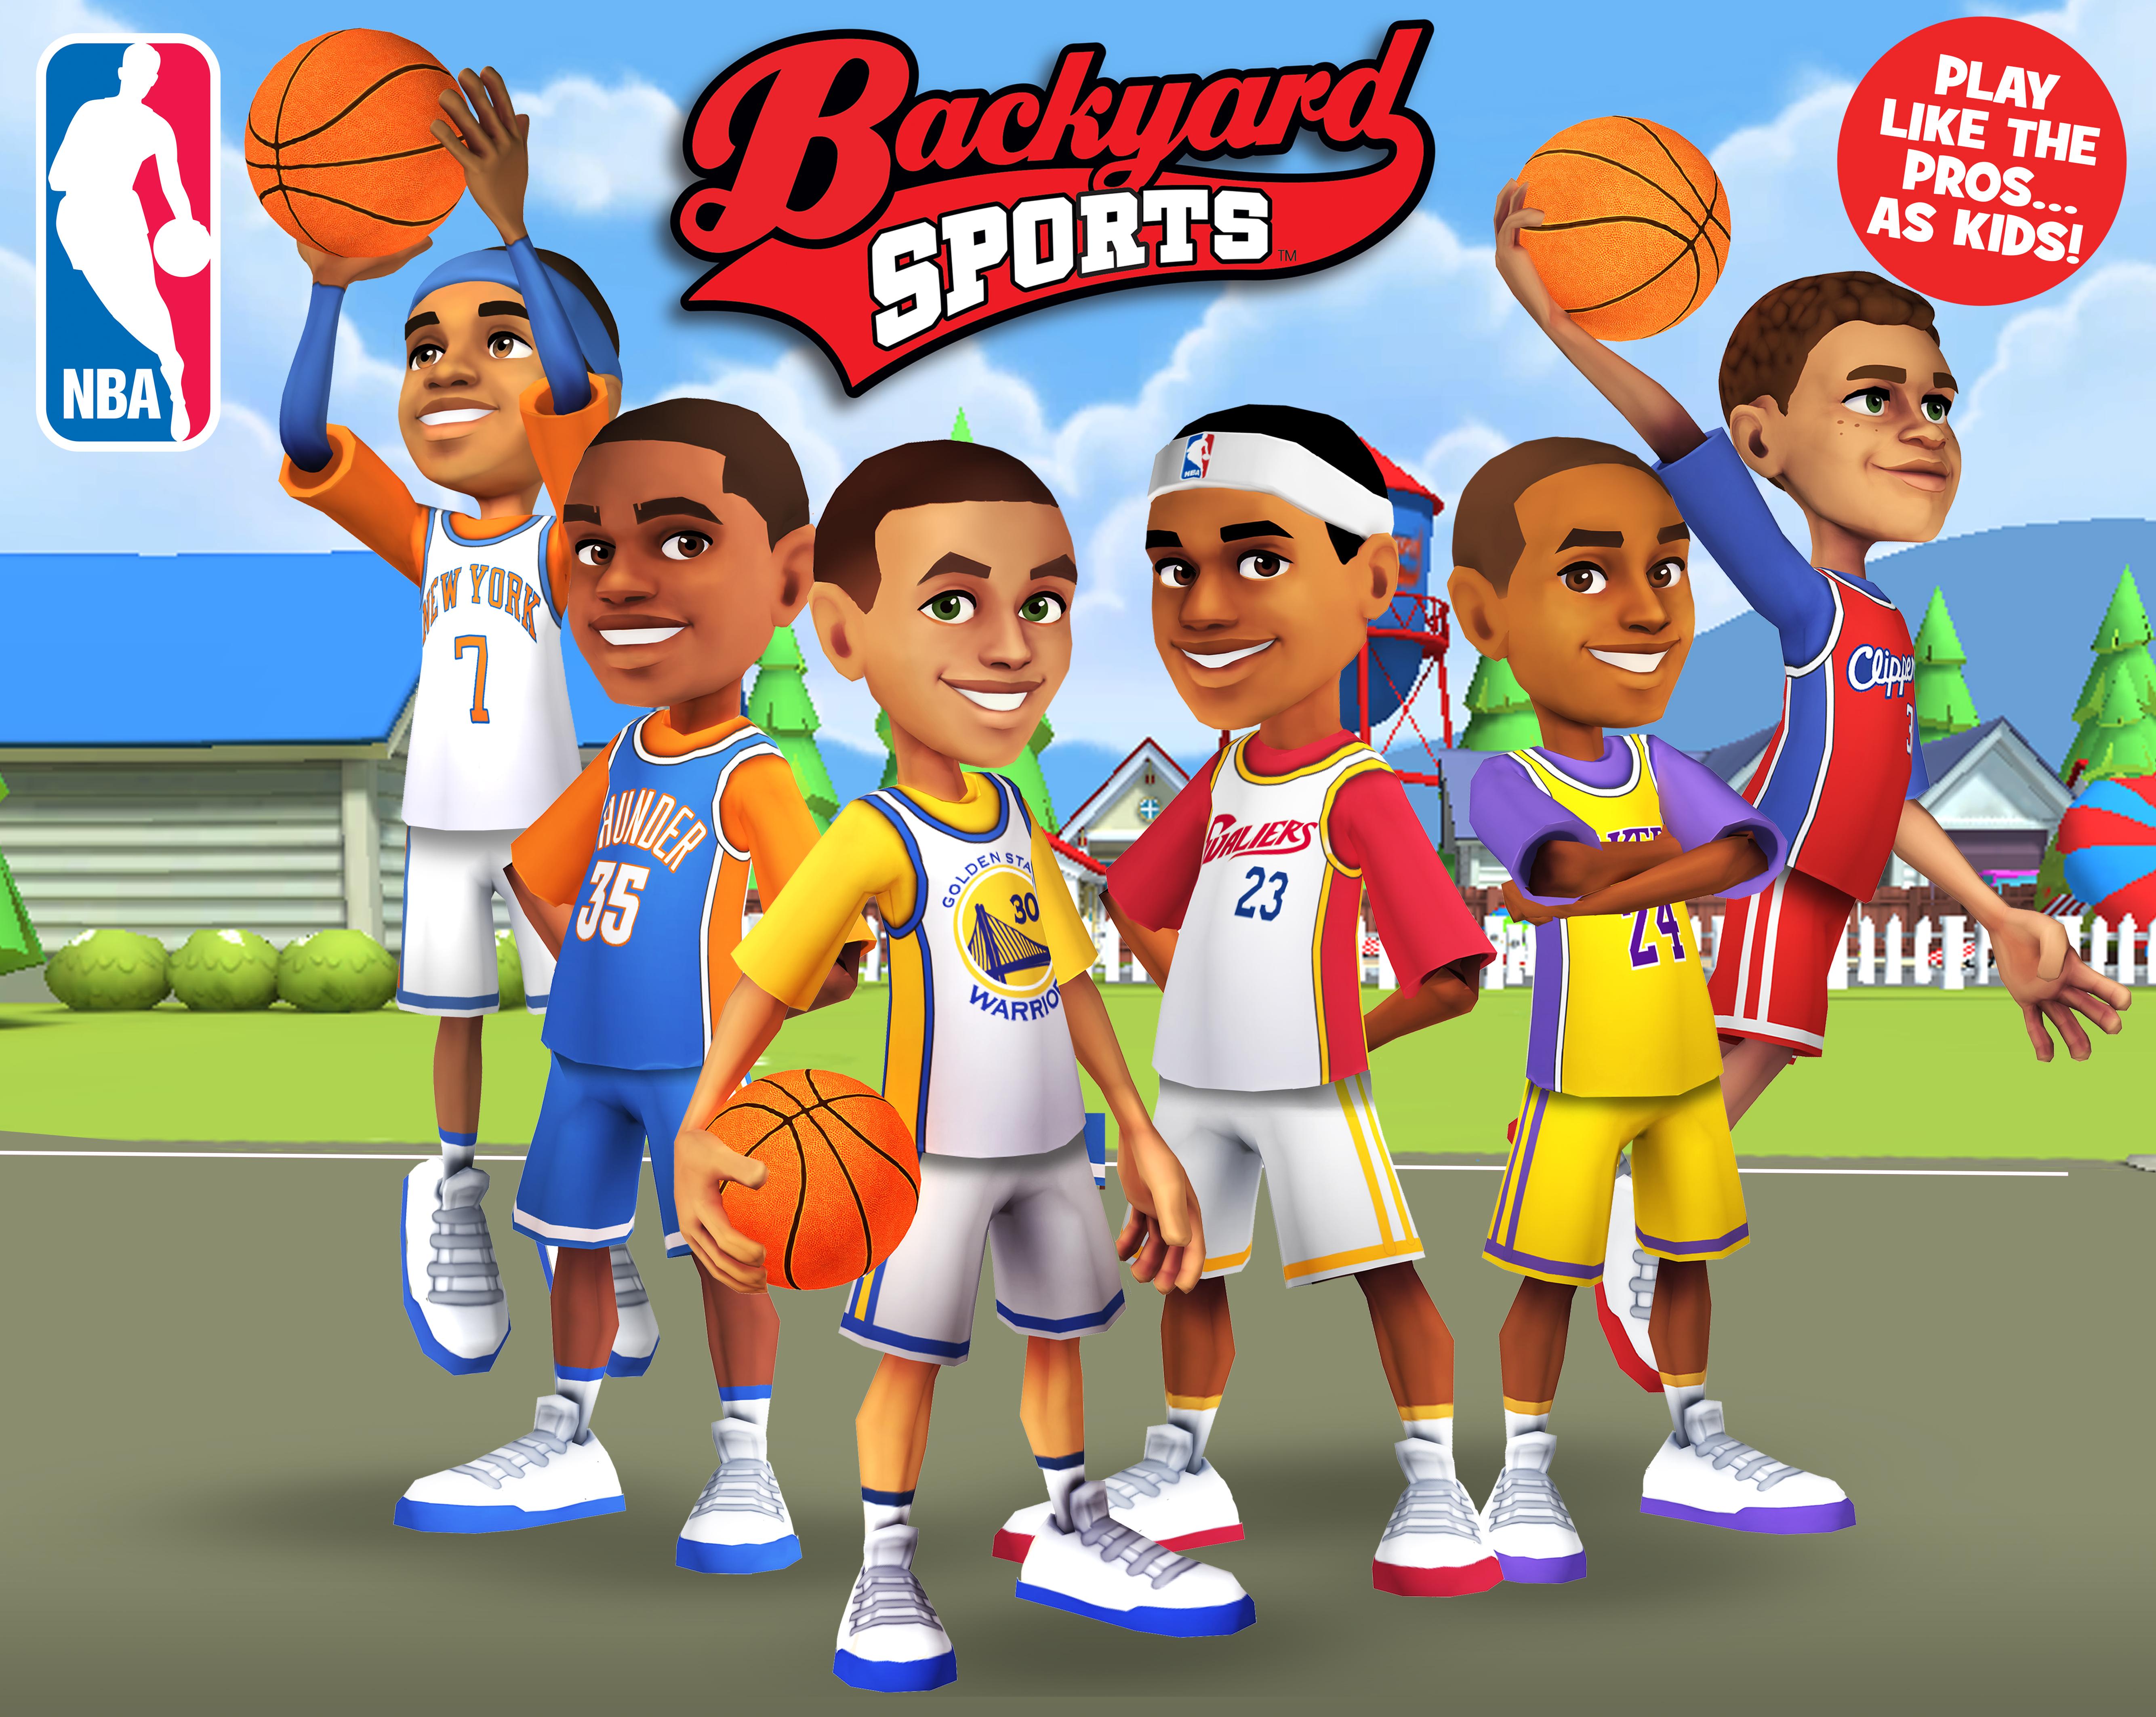 Like Rock Band, New Backyard Sports Mobile Games Let Kids